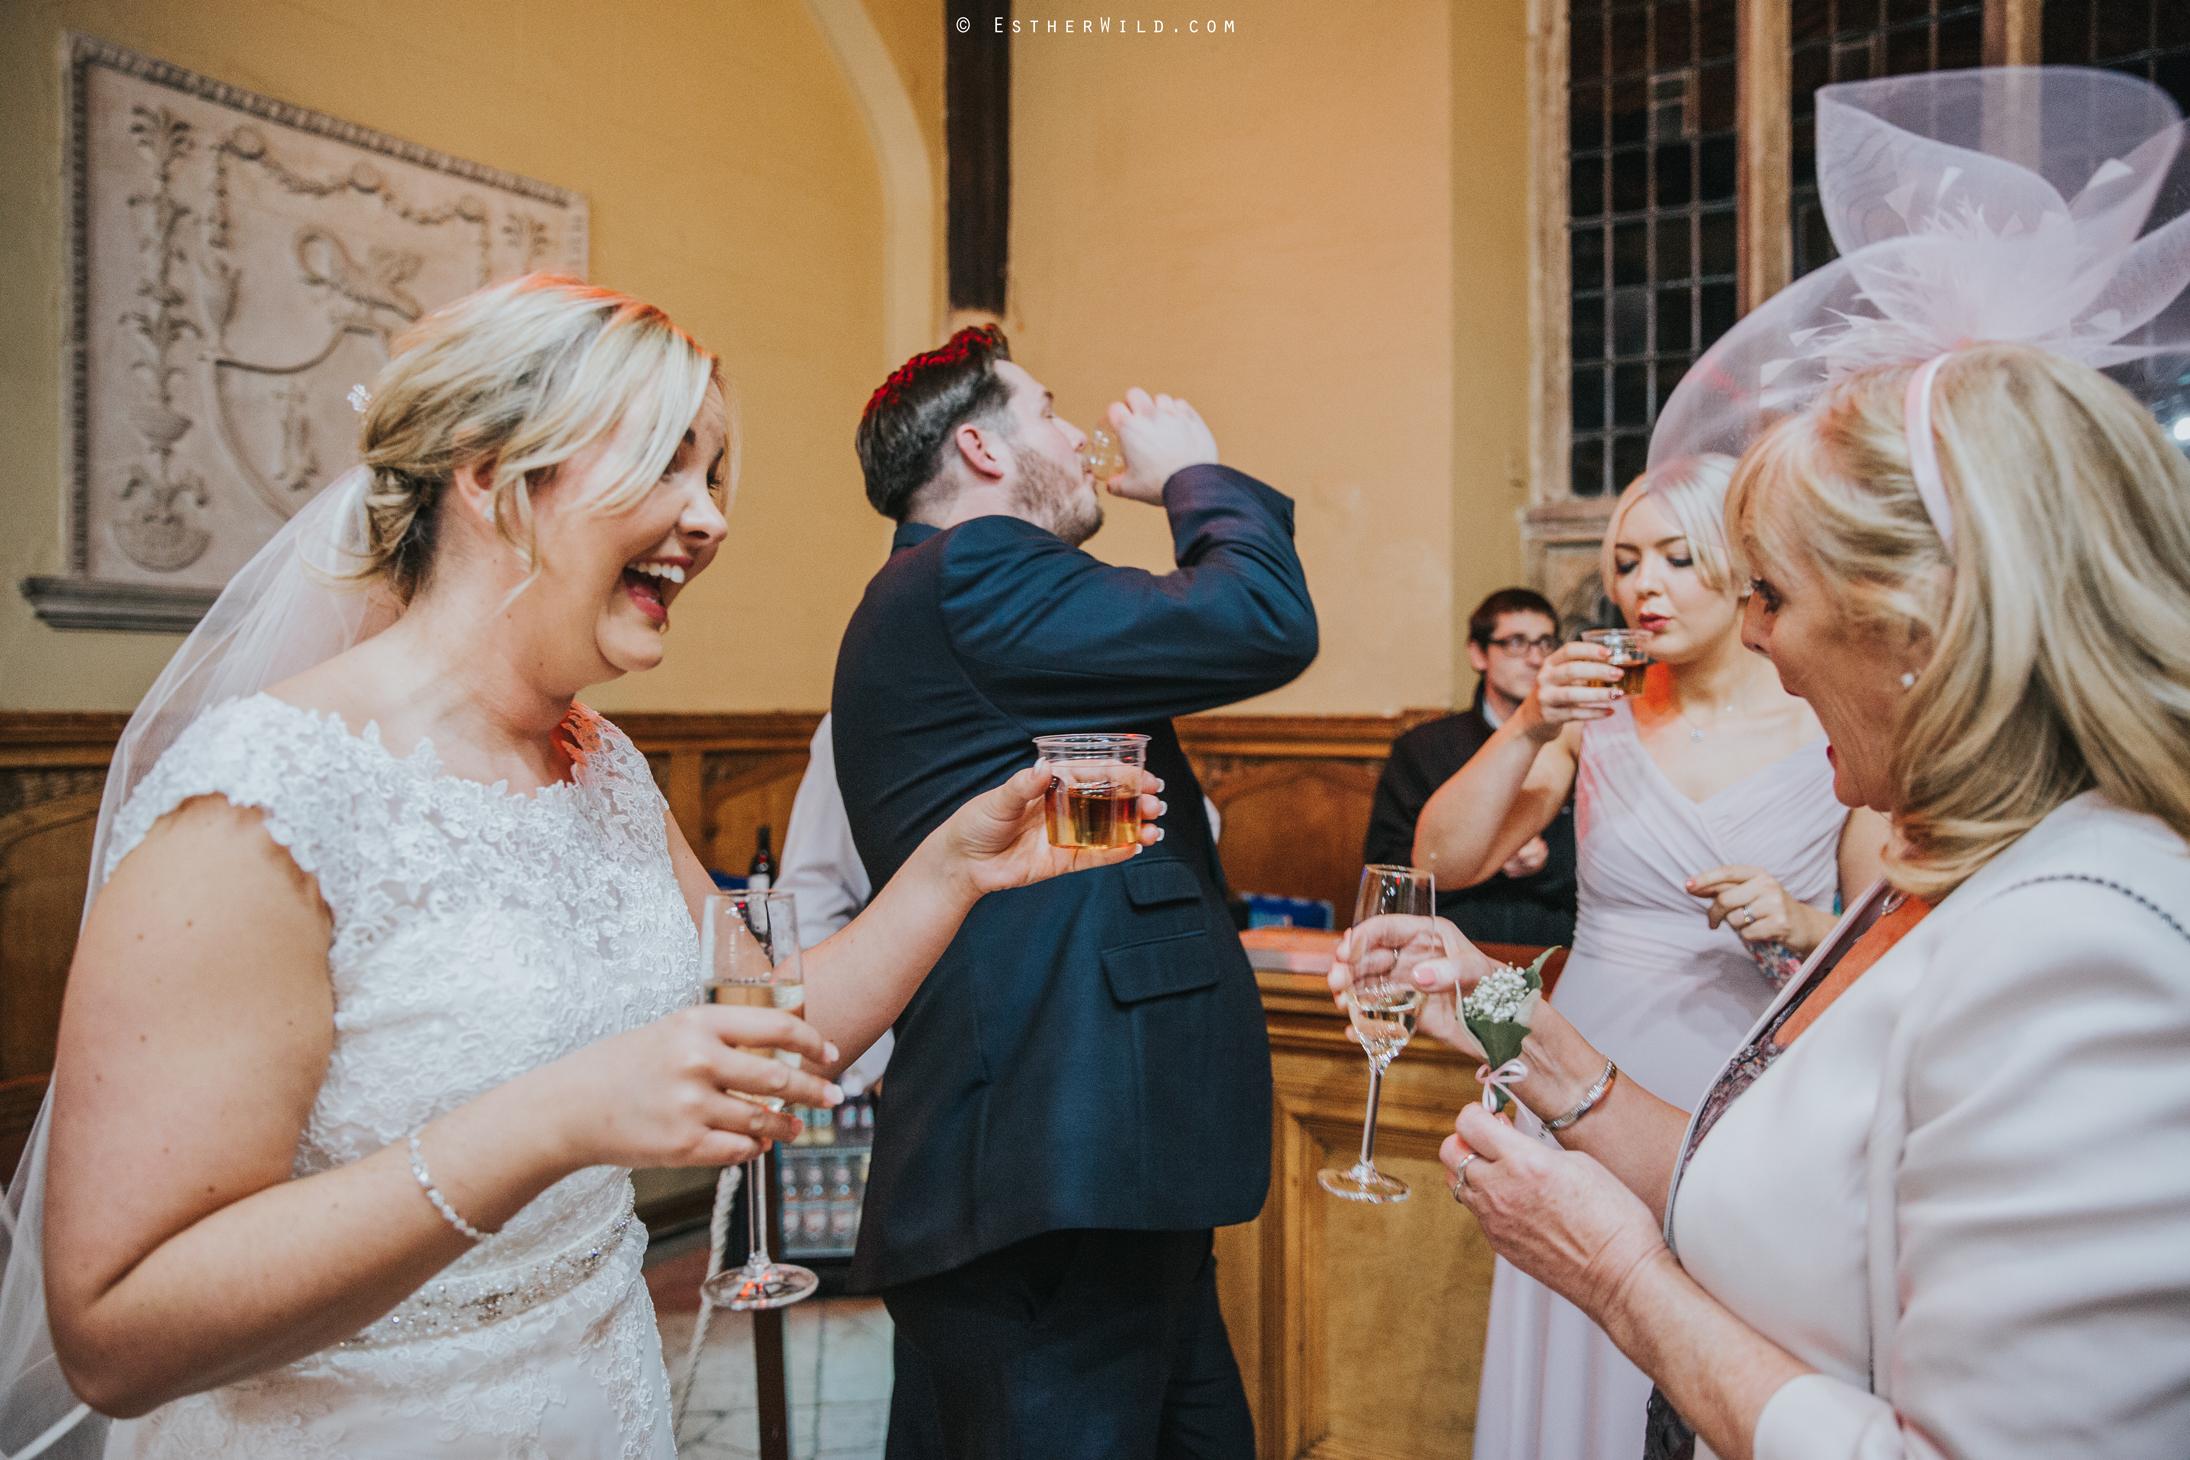 Wedding_Kings_Lynn_Town_Hall_Norfolk_Photographer_Esther_Wild_IMG_1802_IMGL0596.jpg